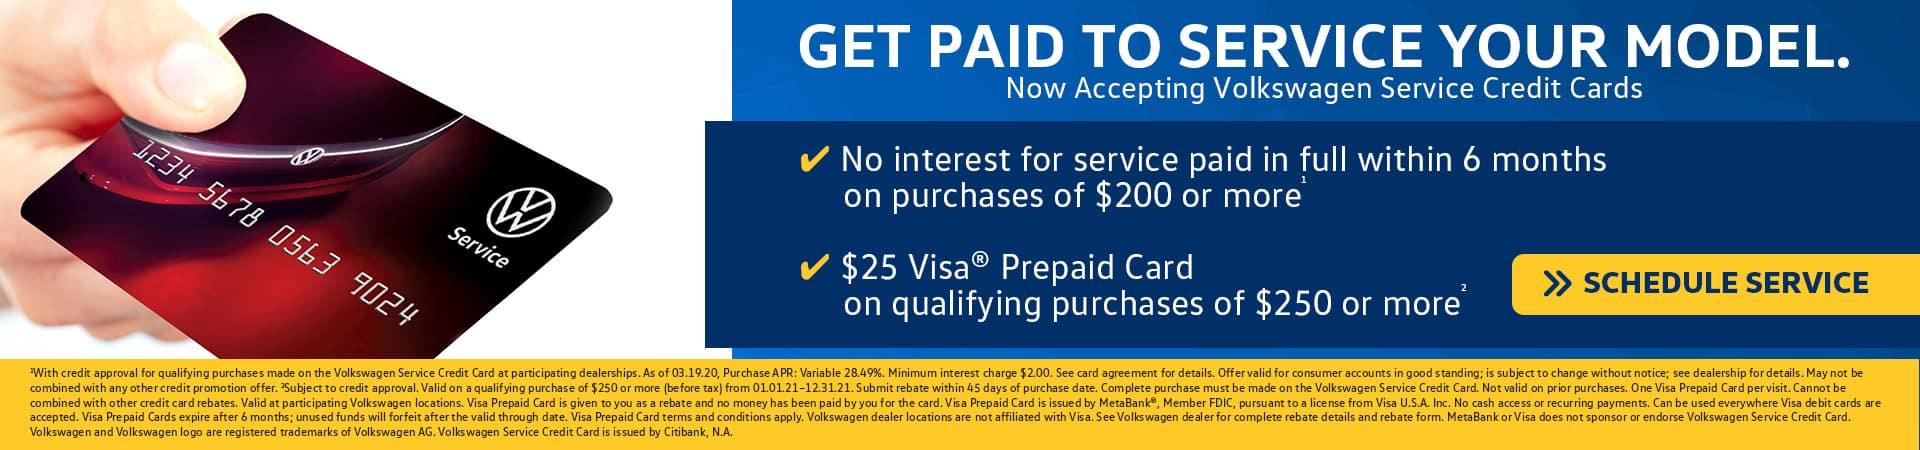 VW Service Credit Card in Tampa, FL